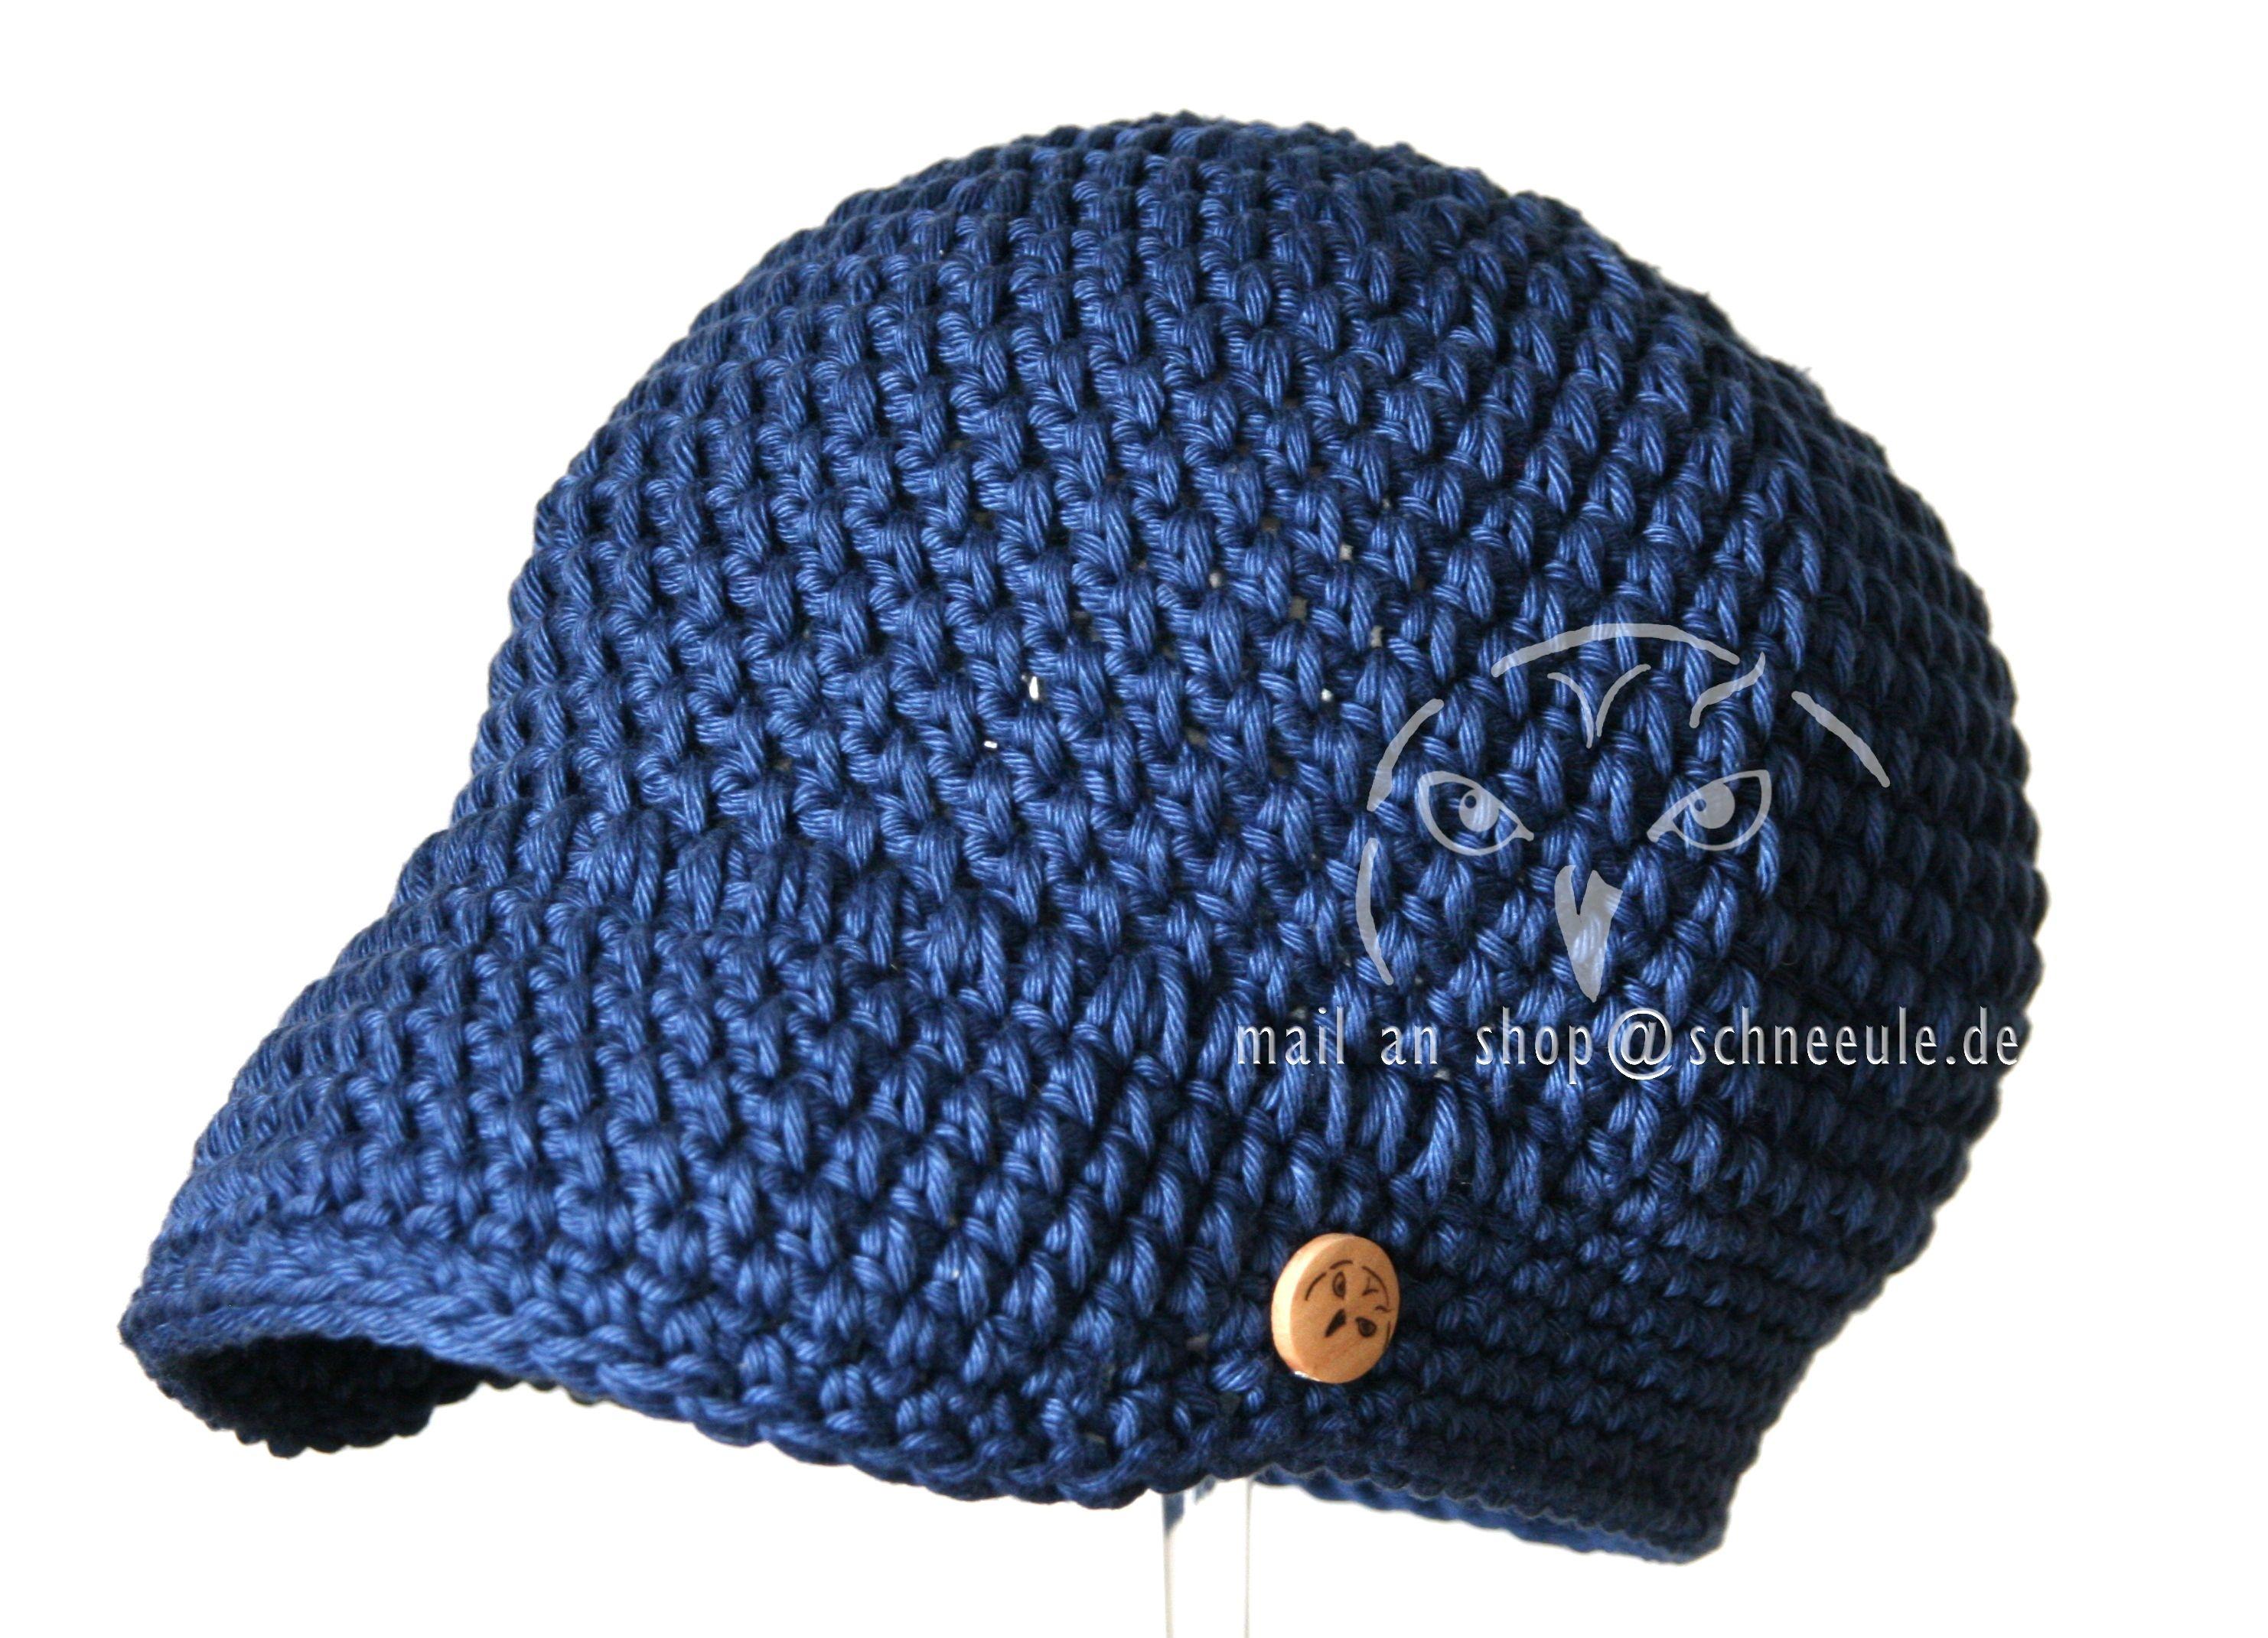 Crochet Hat For Boys Mütze Gehäkelte übergangsmütze Für Jungen